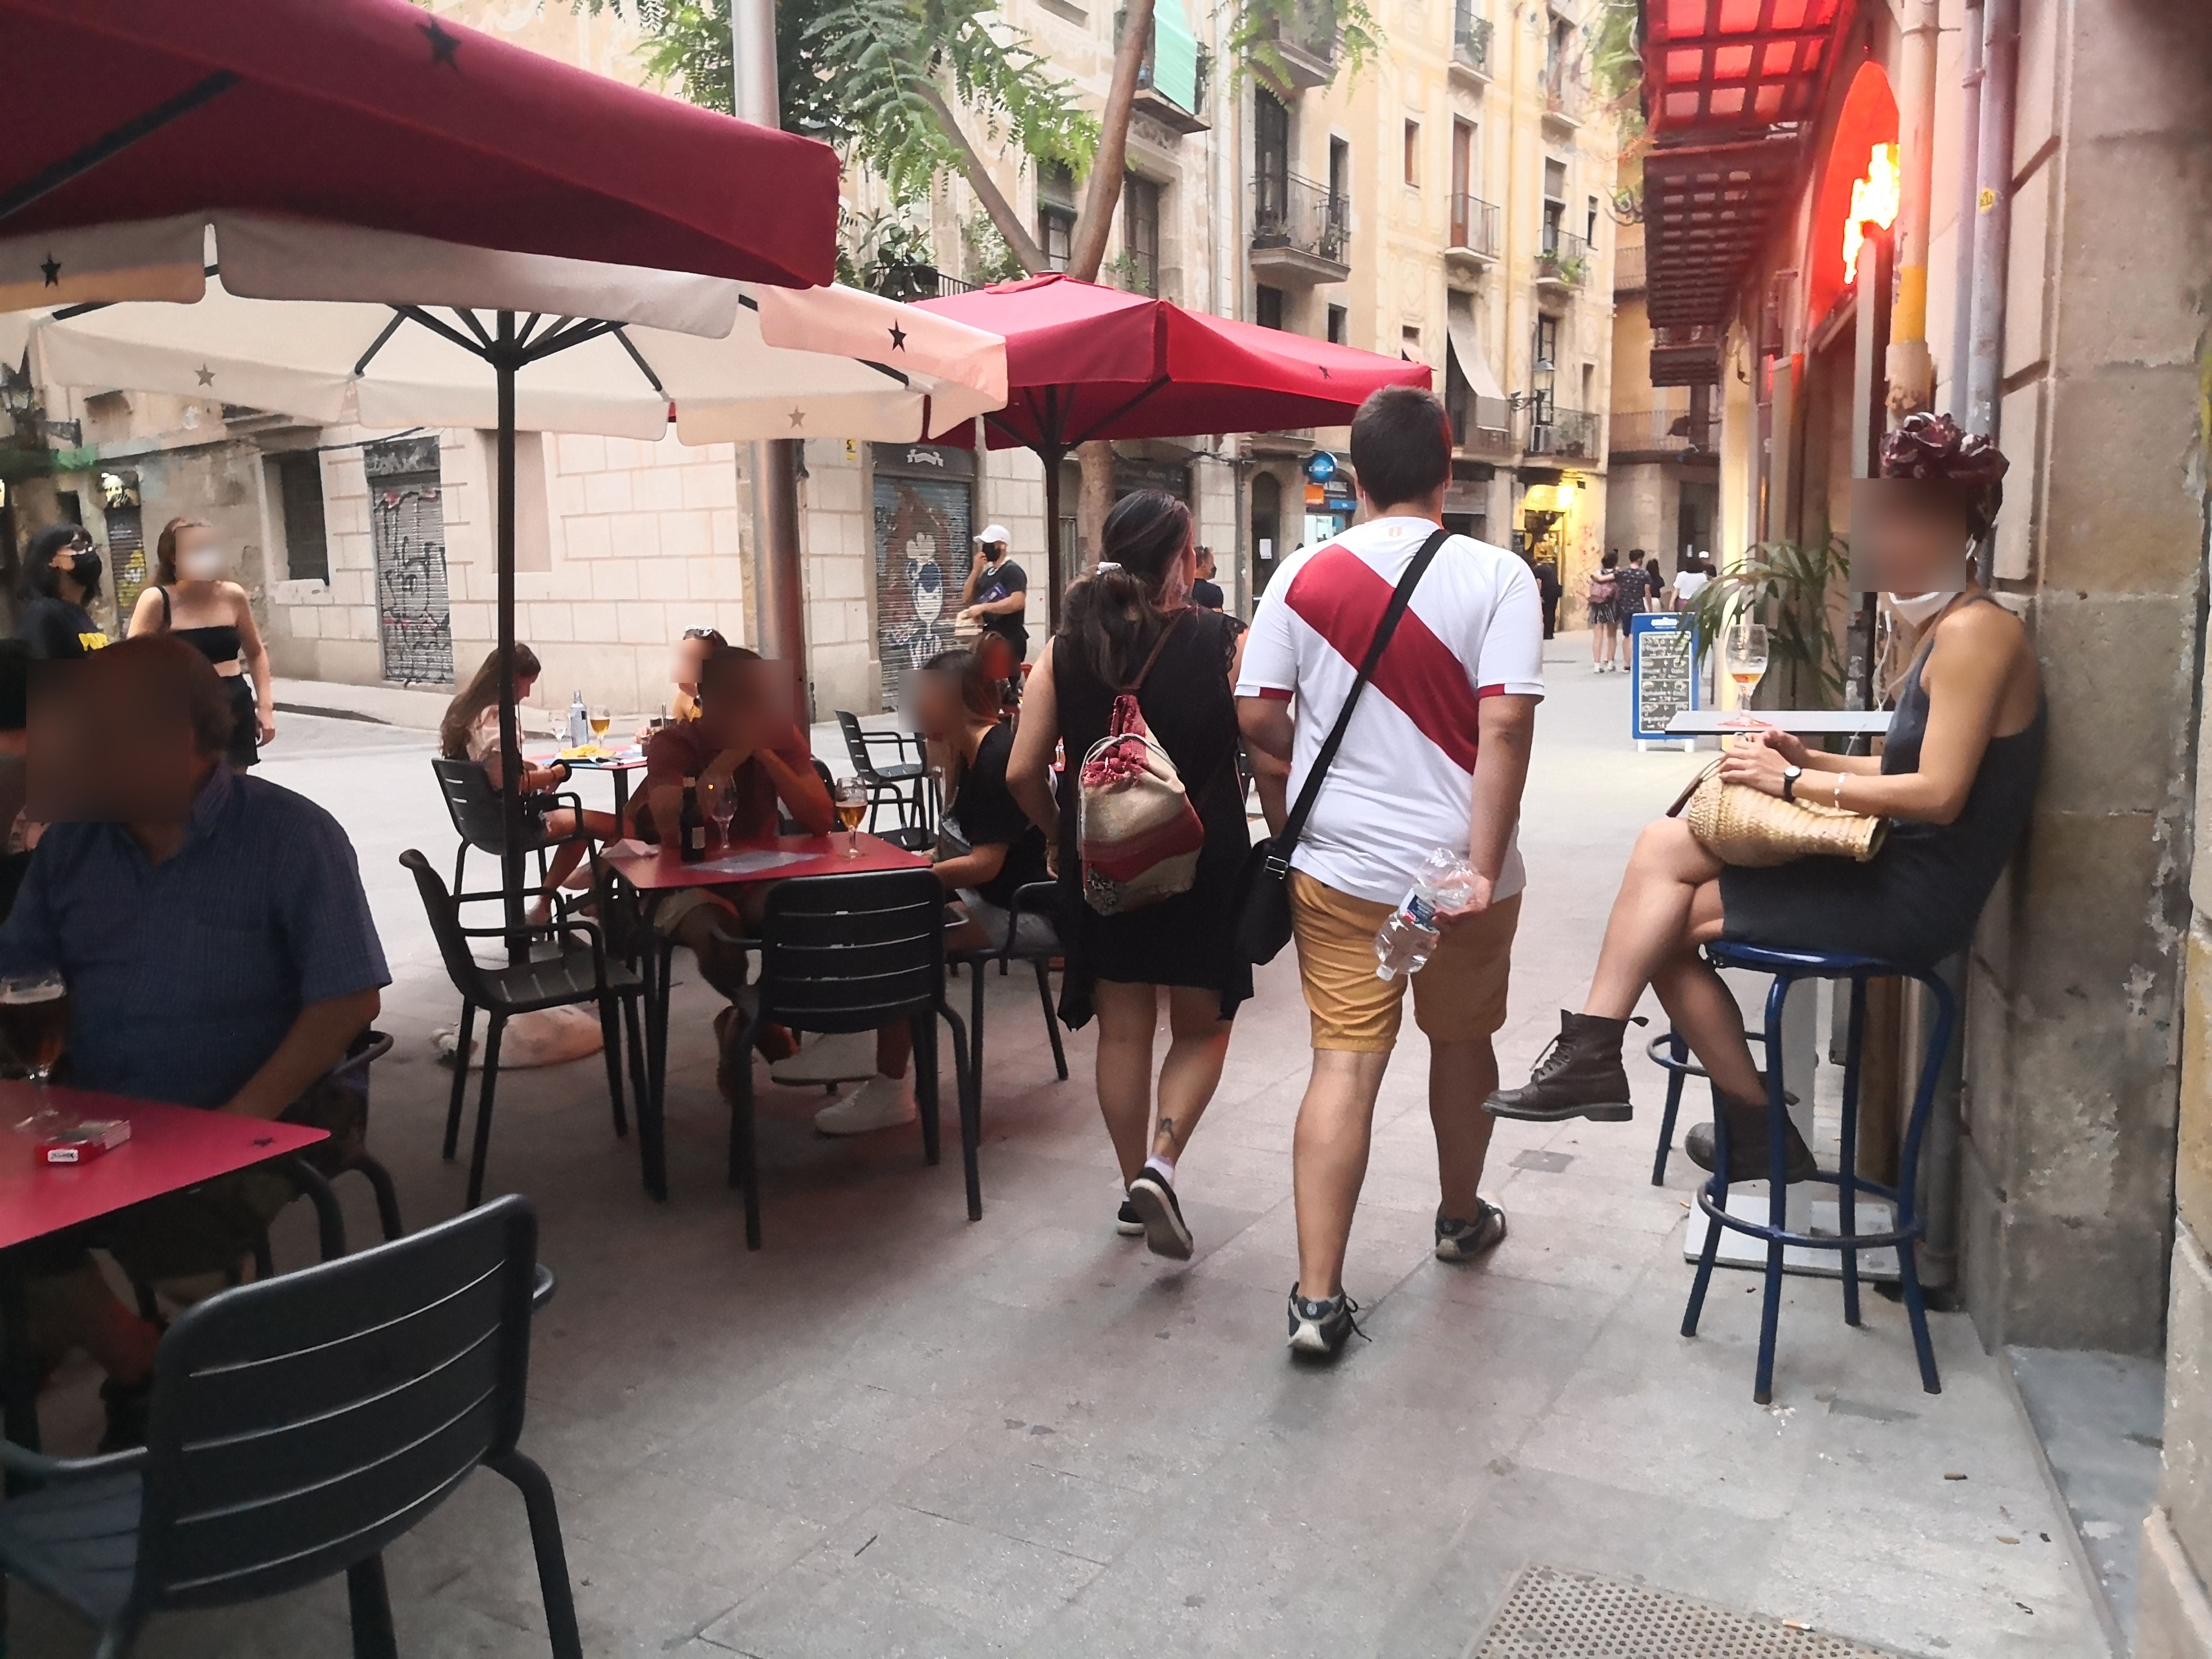 Plaça de Sant Agustí Vell, 6 - okupant façana i estretant el pas de vorera!!